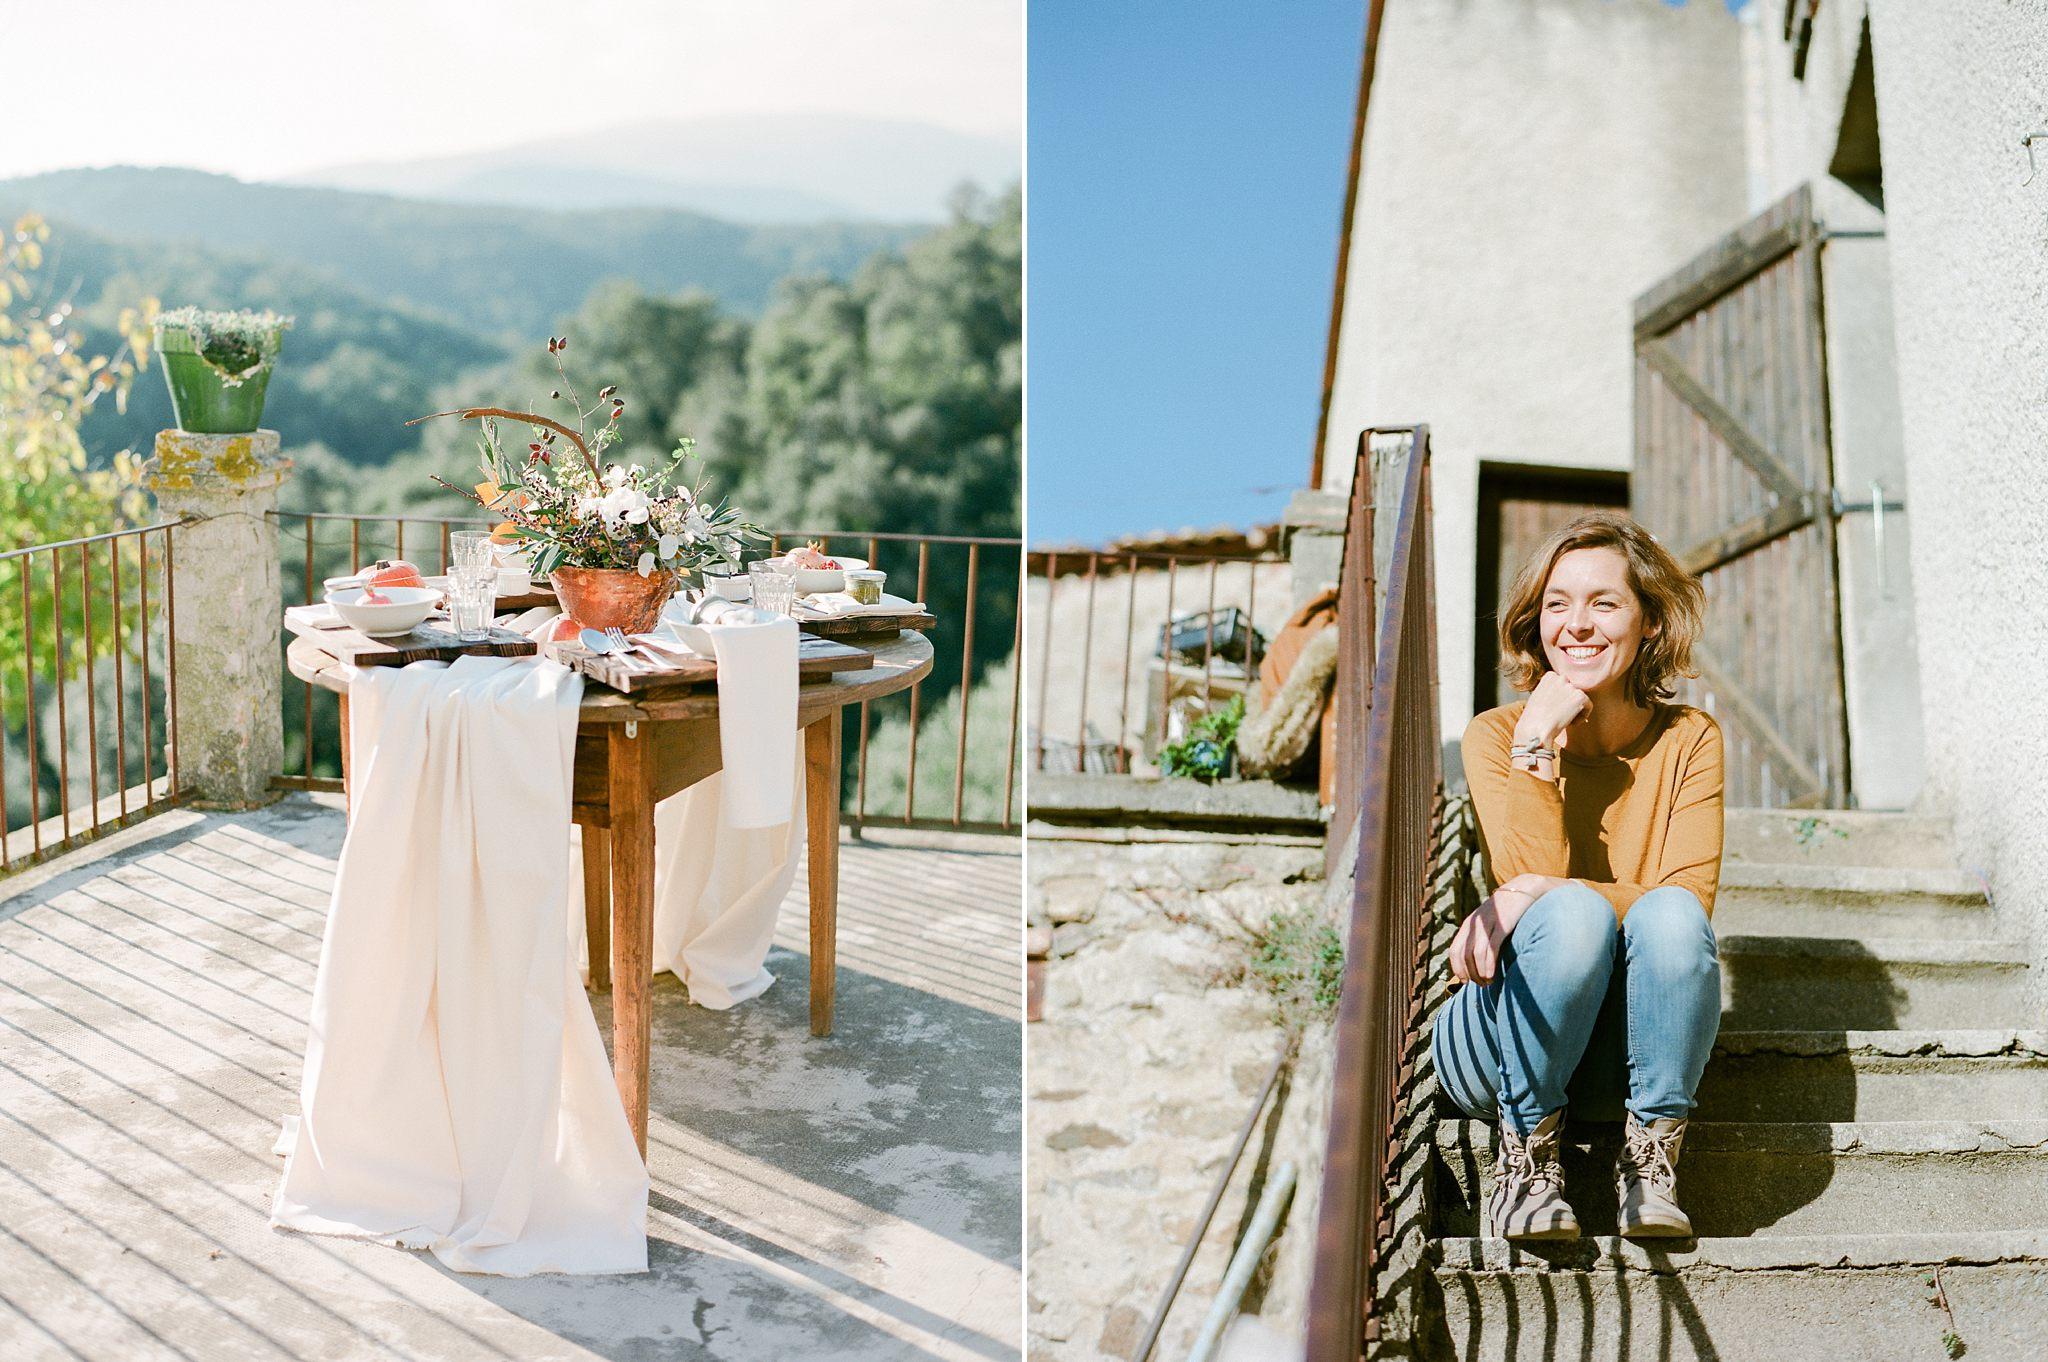 Mariage-a-la-maison-secall-hugo-hennequin-photographe-mariage-perpignan_0117.jpg